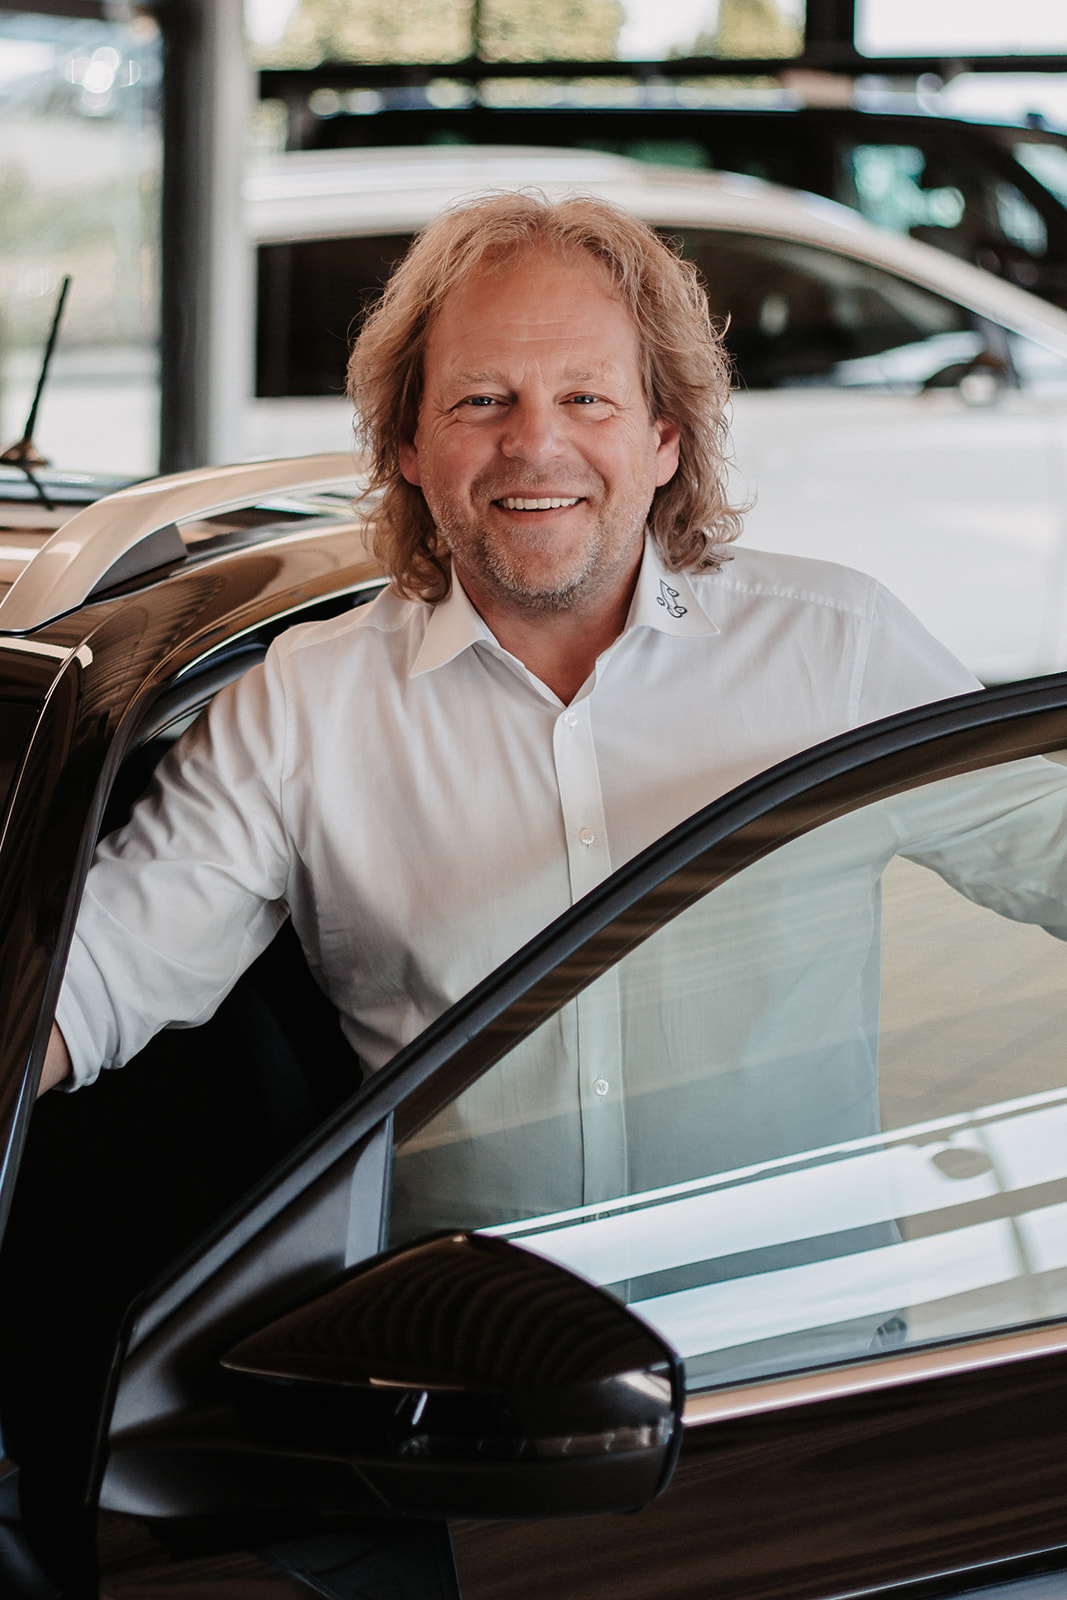 Thorsten Golbig